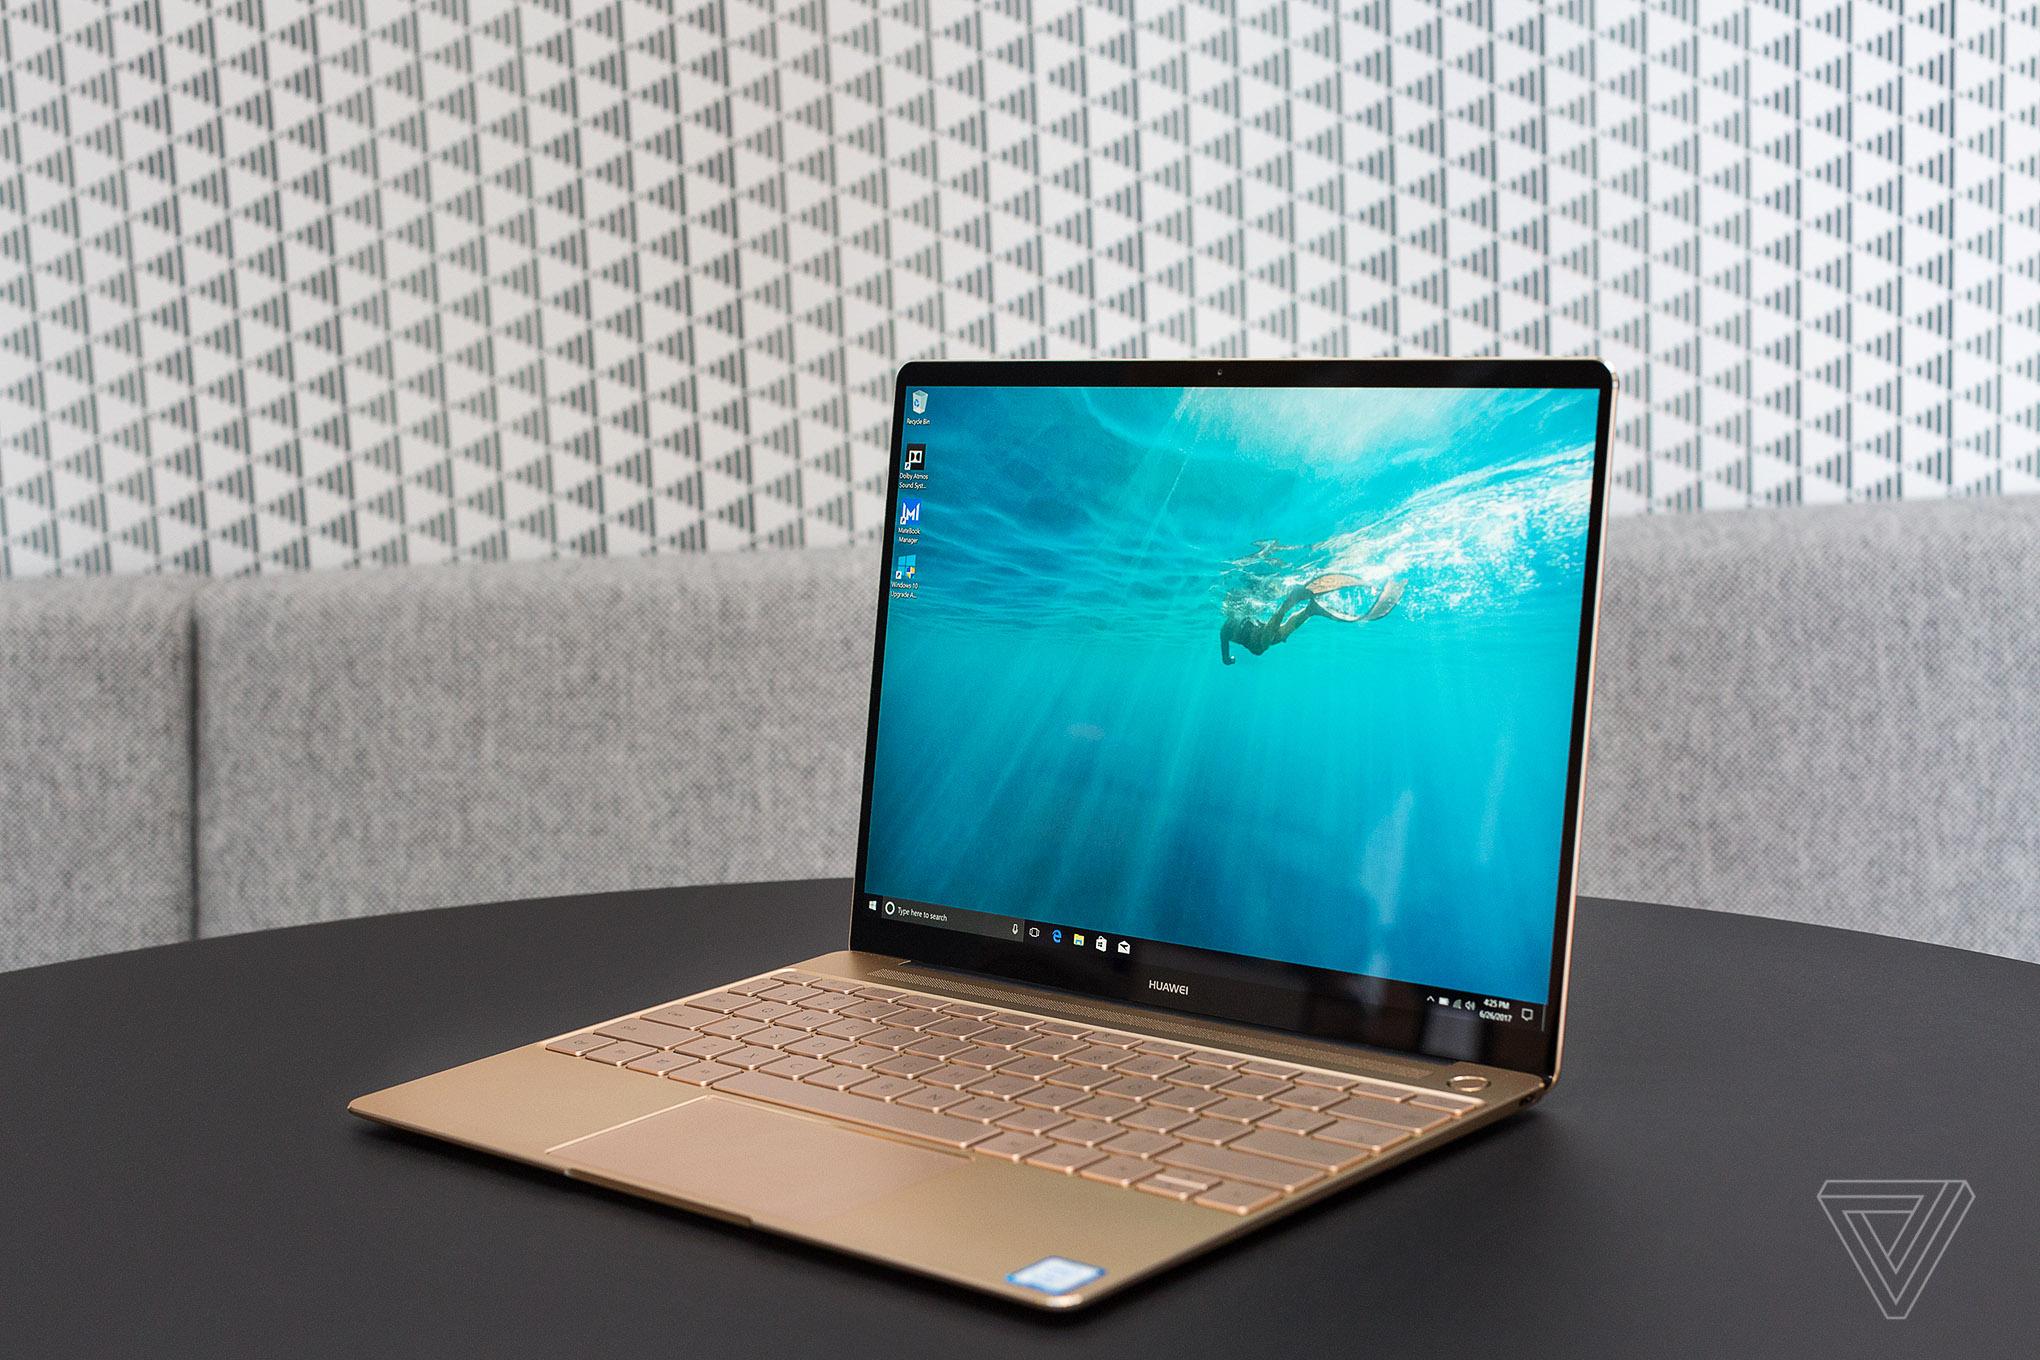 Black friday laptop computer deals online